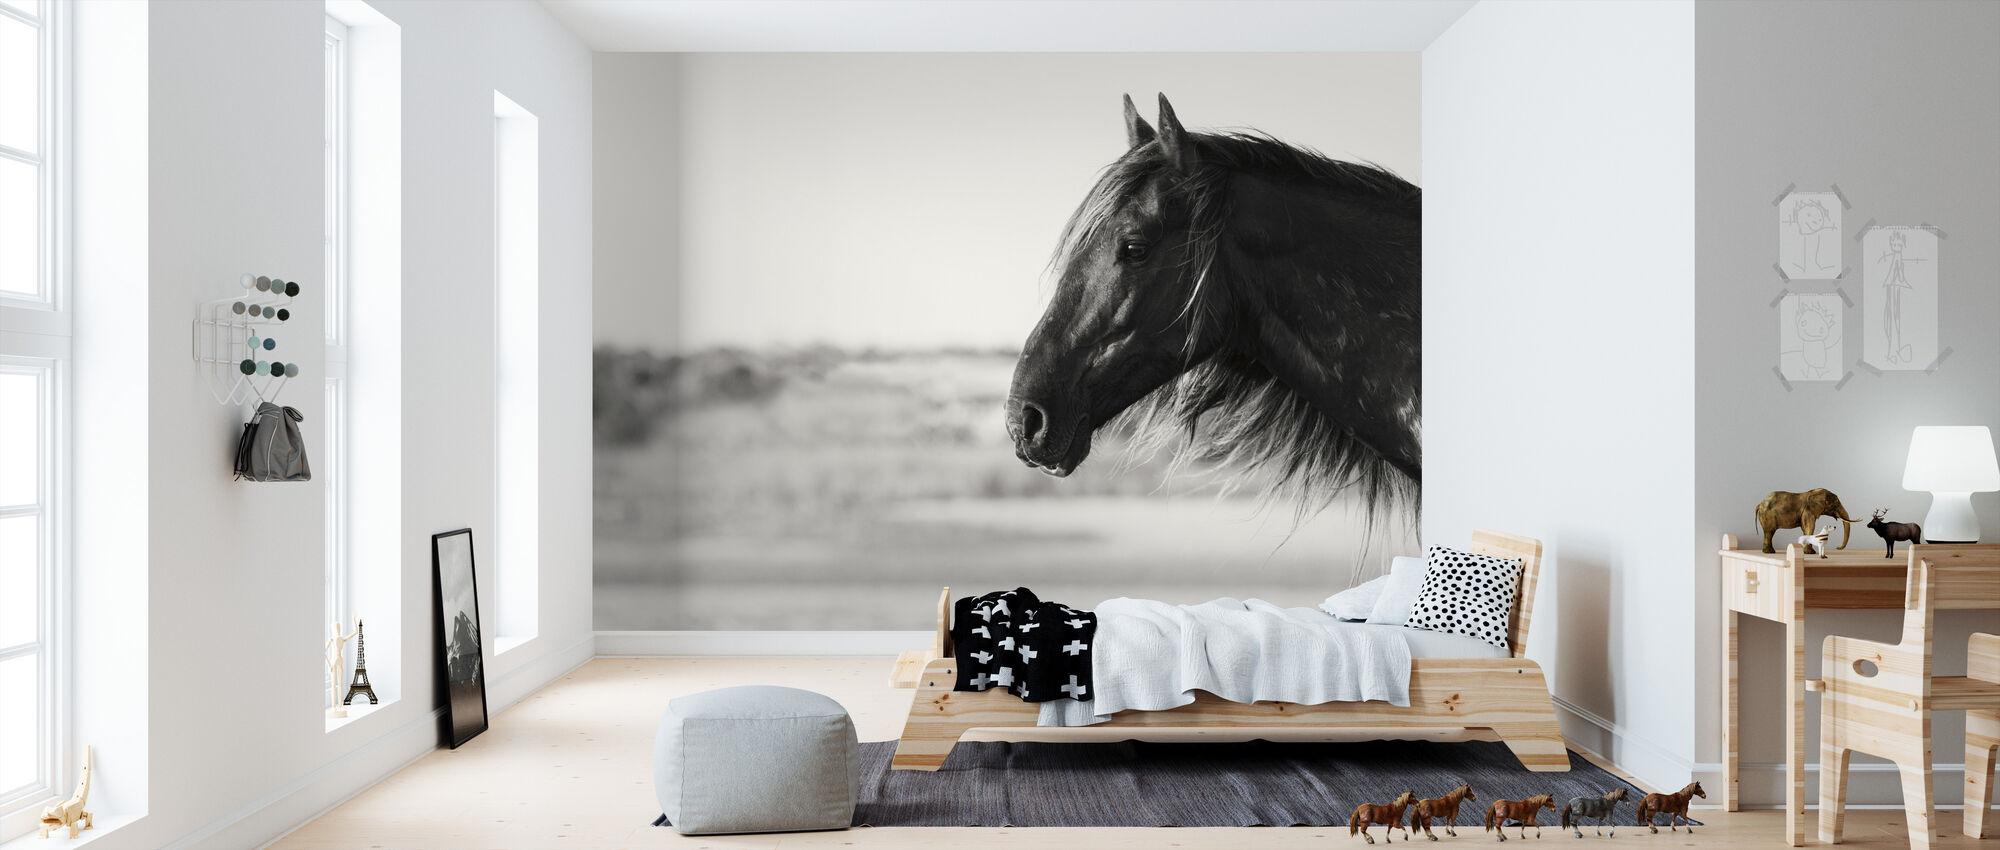 Pretty Girl - Wallpaper - Kids Room